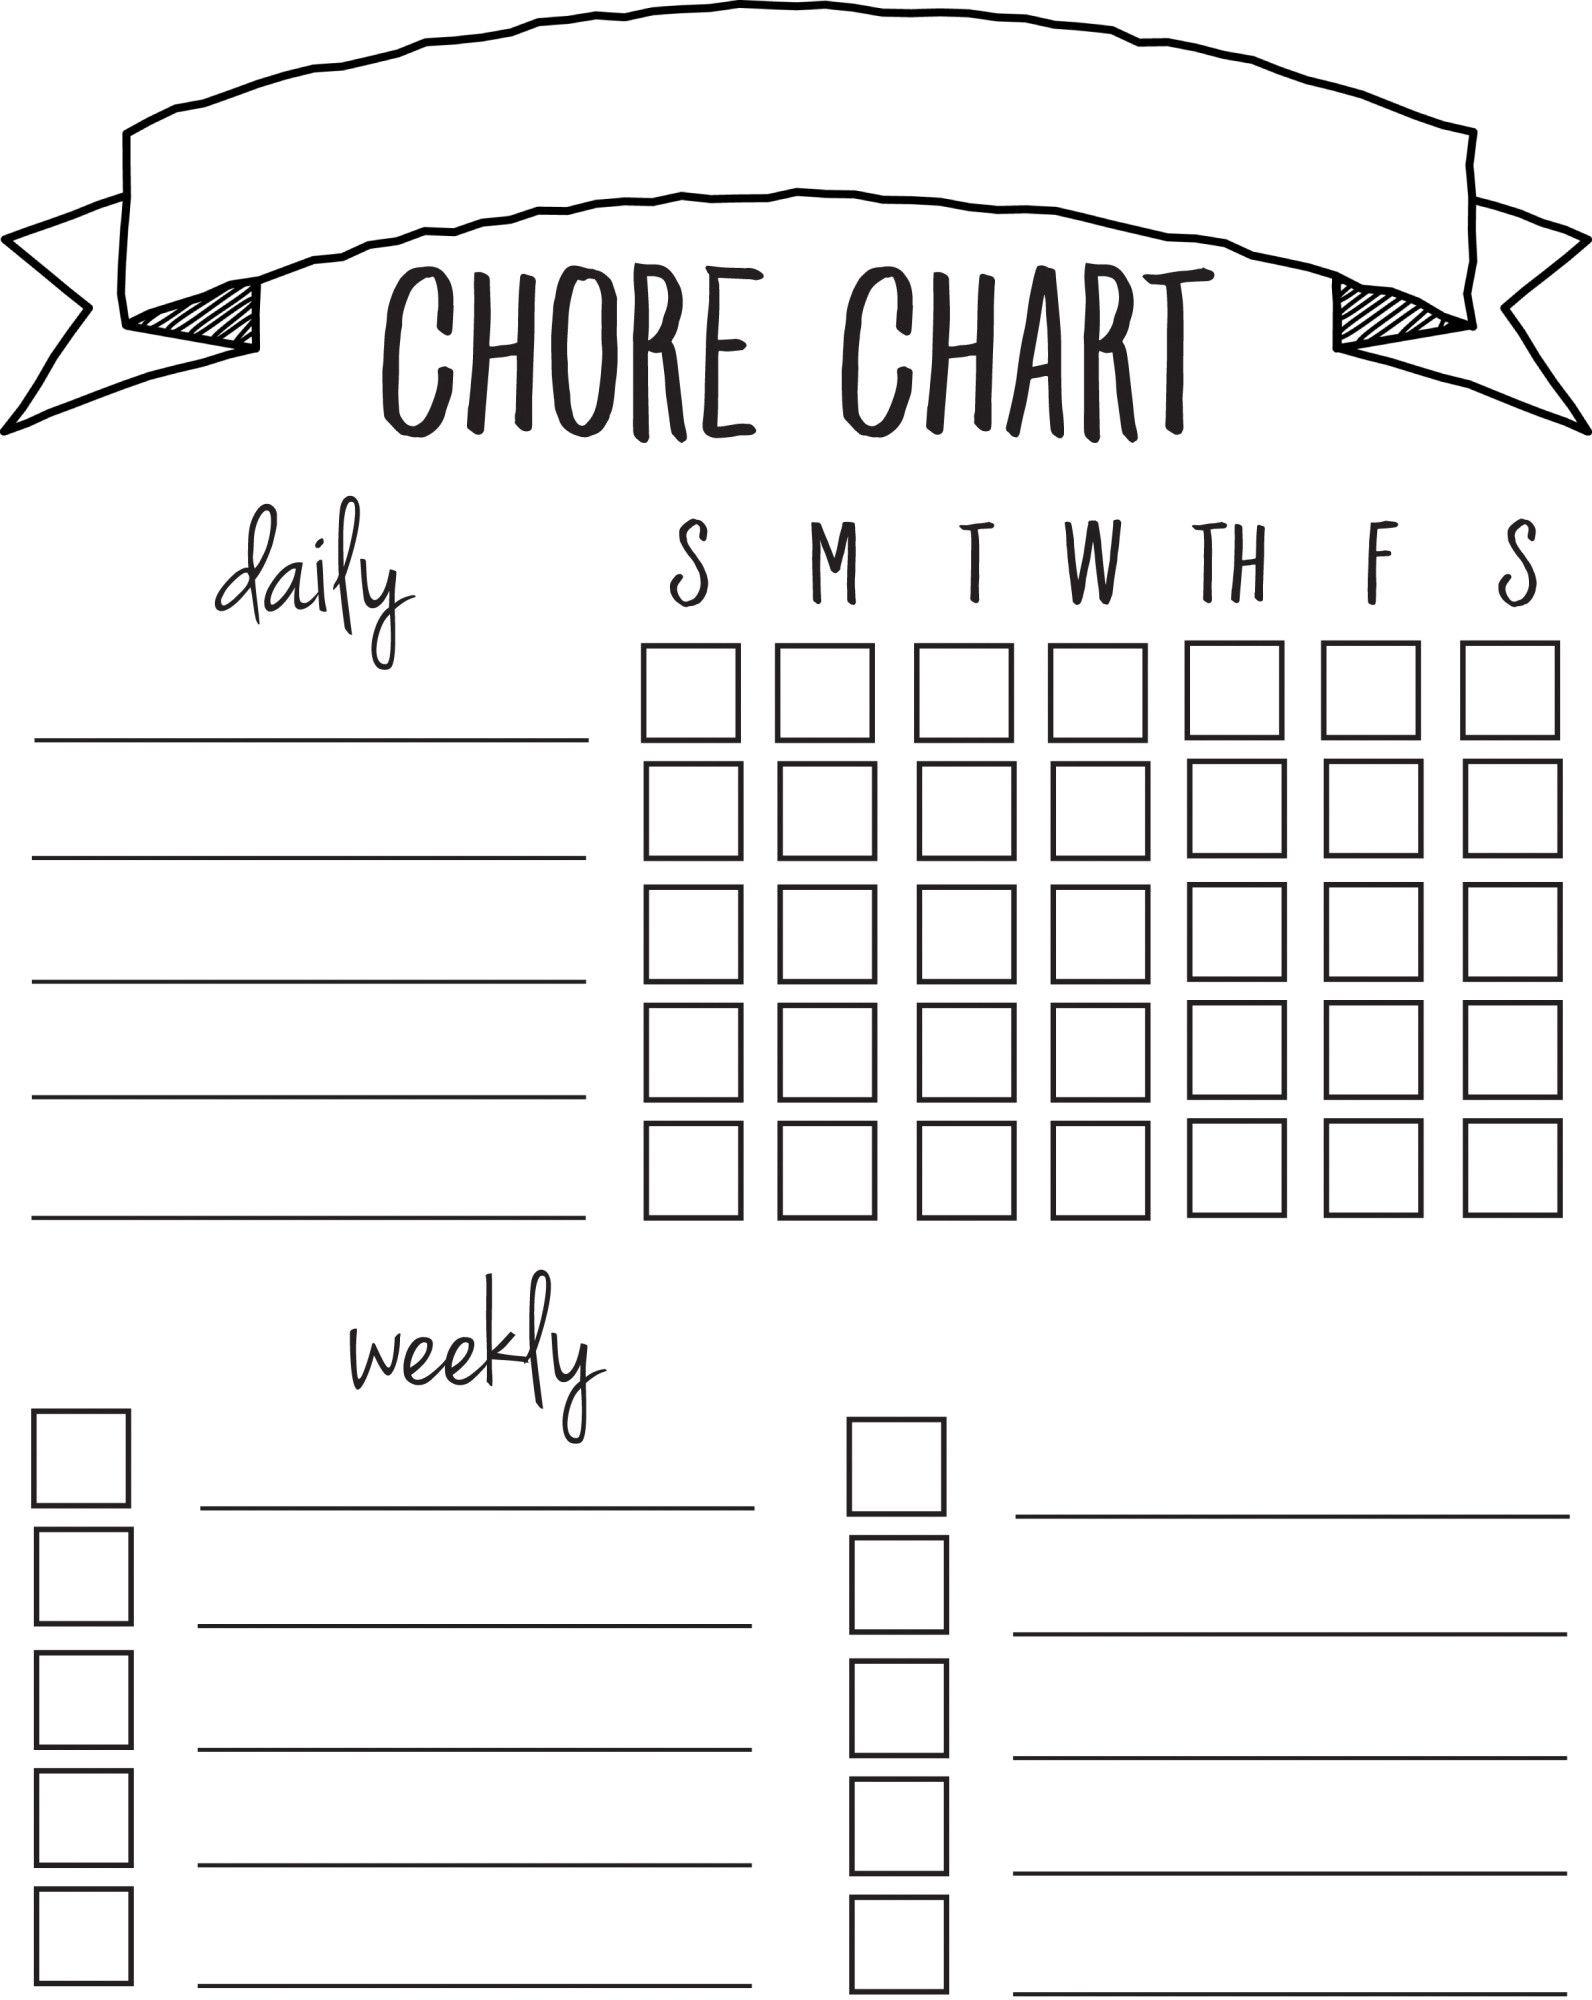 Diy Printable Chore Chart | Free Printables Nov/feb | Chore Chart - Free Printable Pictures For Chore Charts